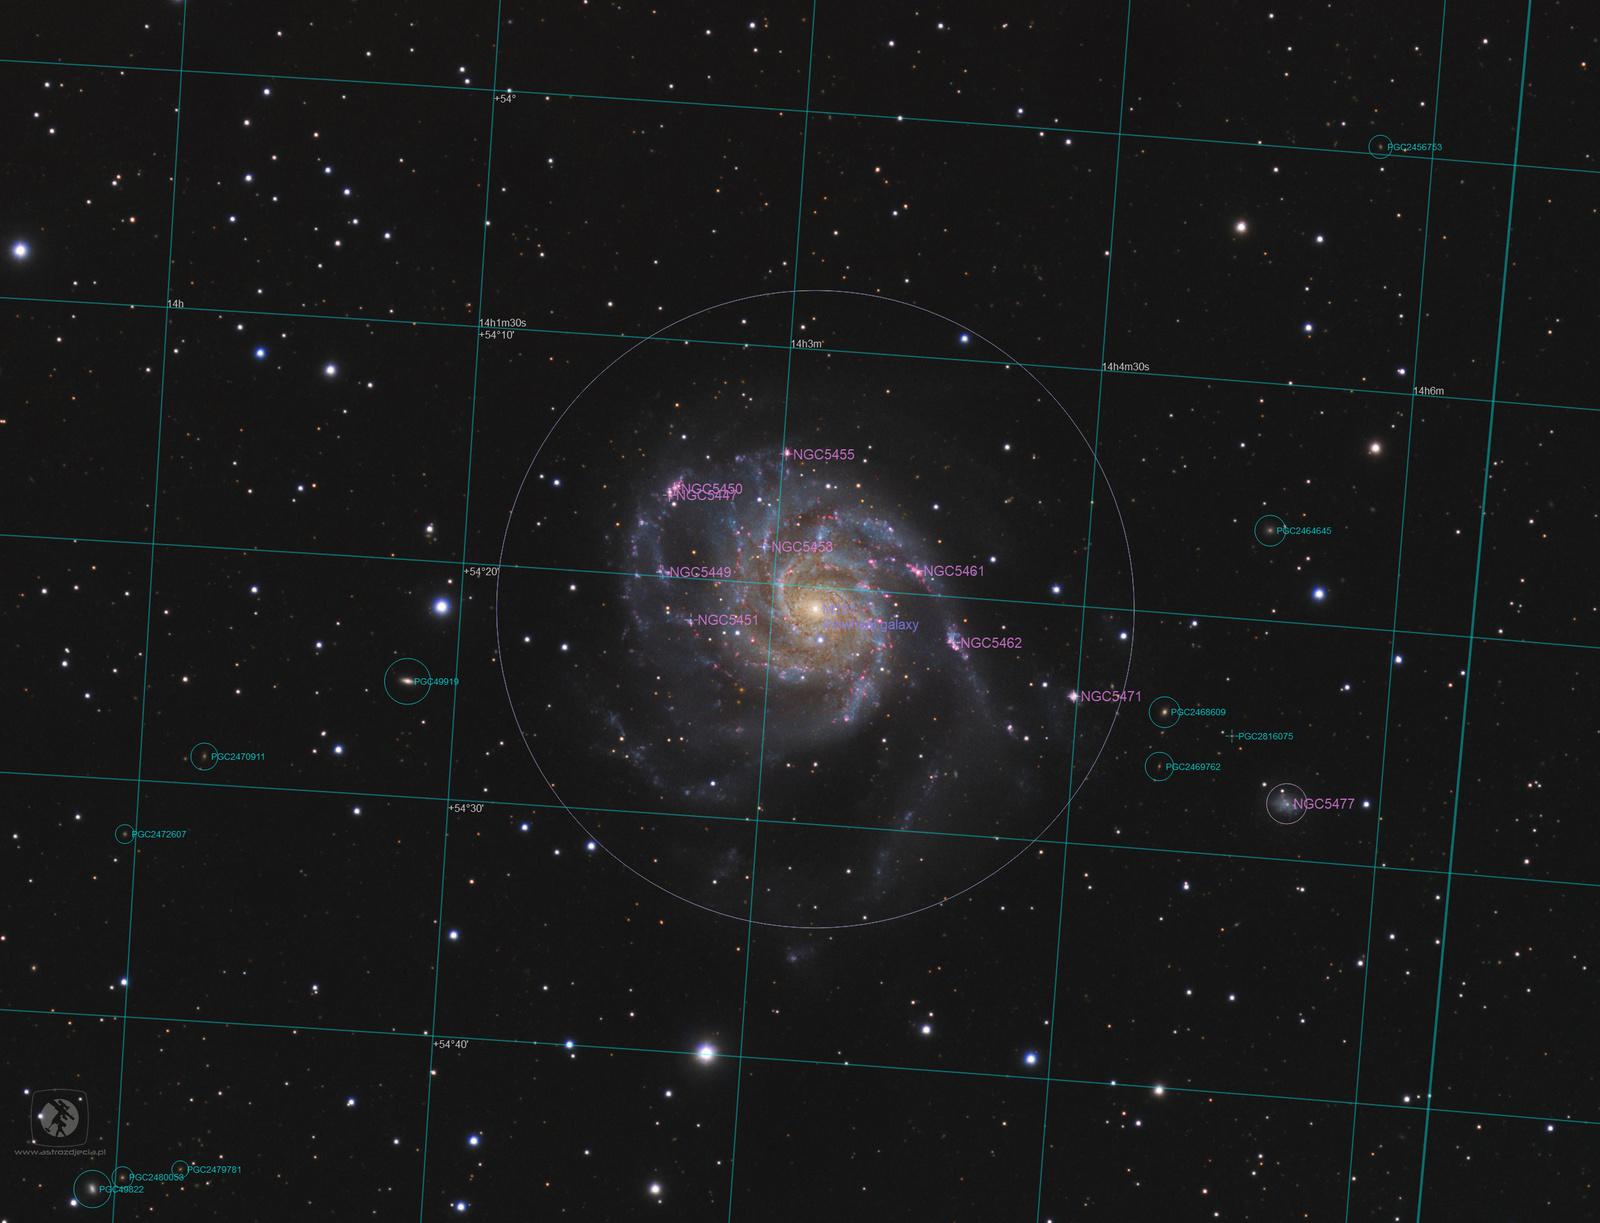 M101-gotowe2-opis.thumb.jpg.6a8a88f2df54a463b2dae4462b14e150.jpg